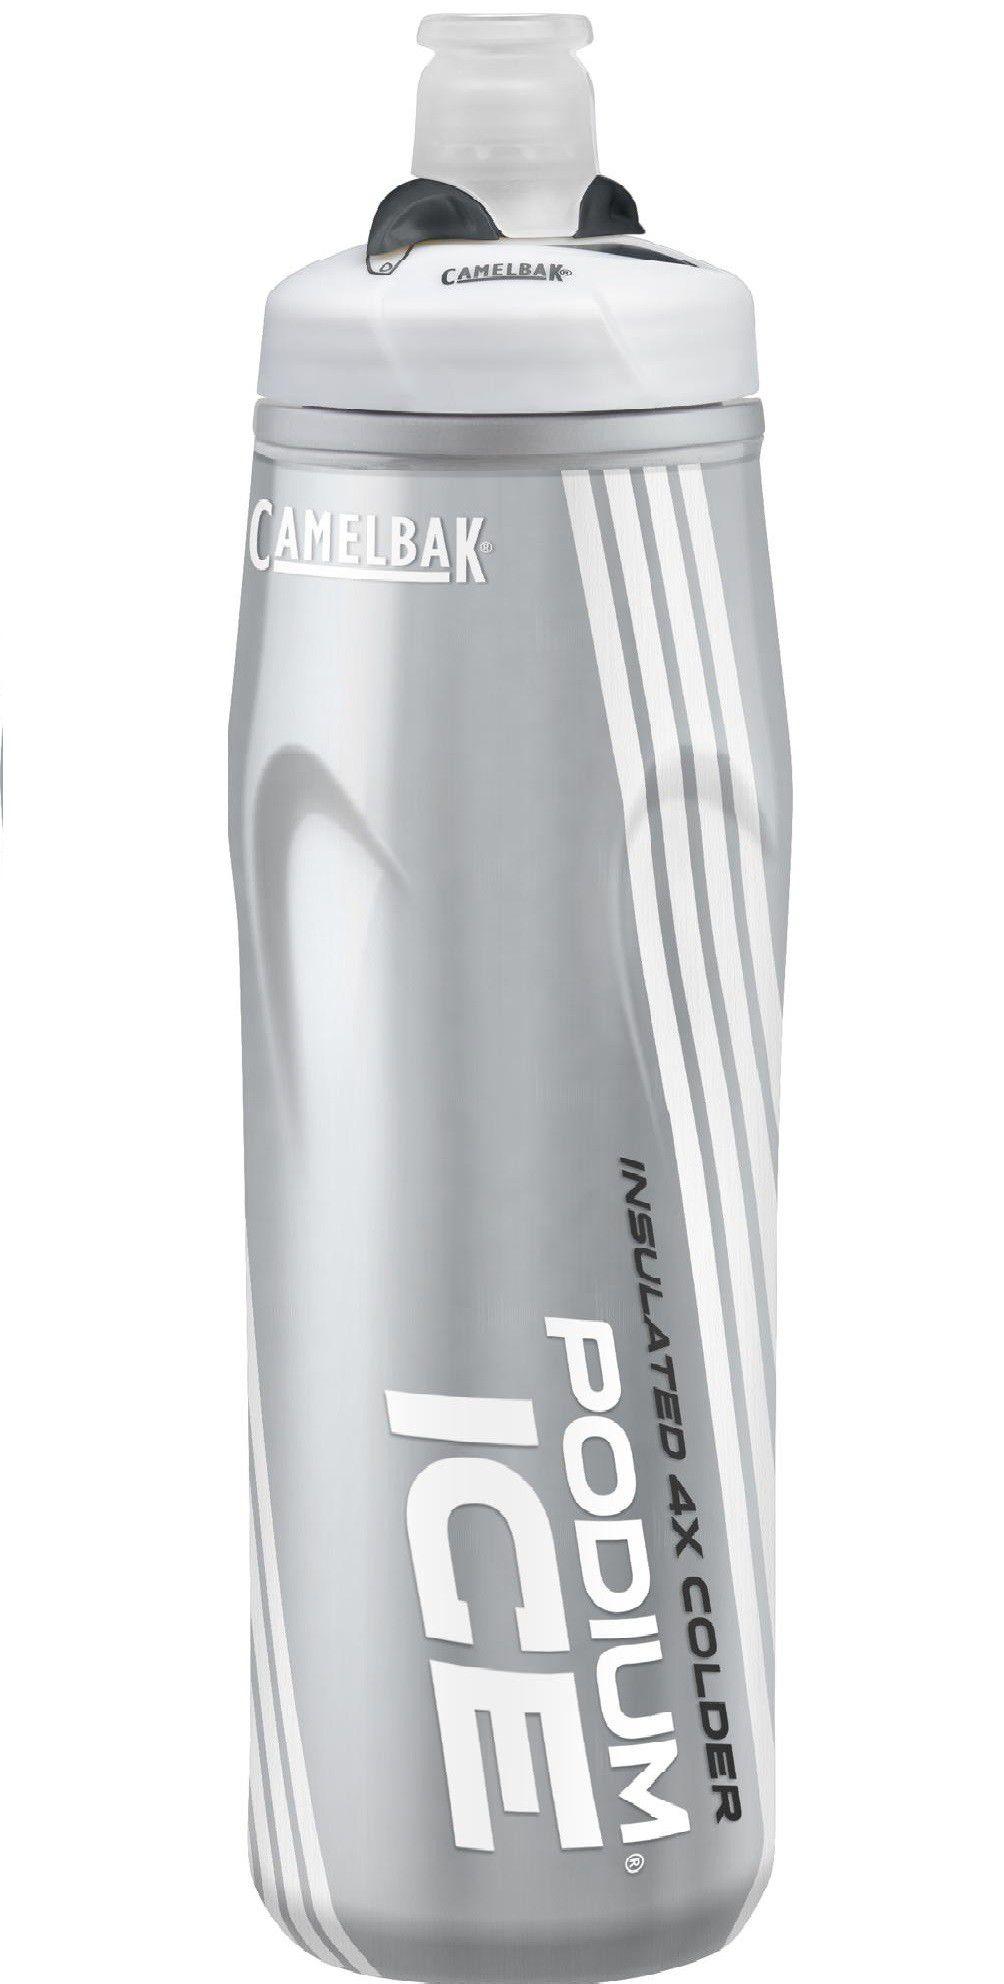 Garrafa Squeeze Camelbak Podium Ice 4x Mais Térmica 620 Ml Cinza/Preta